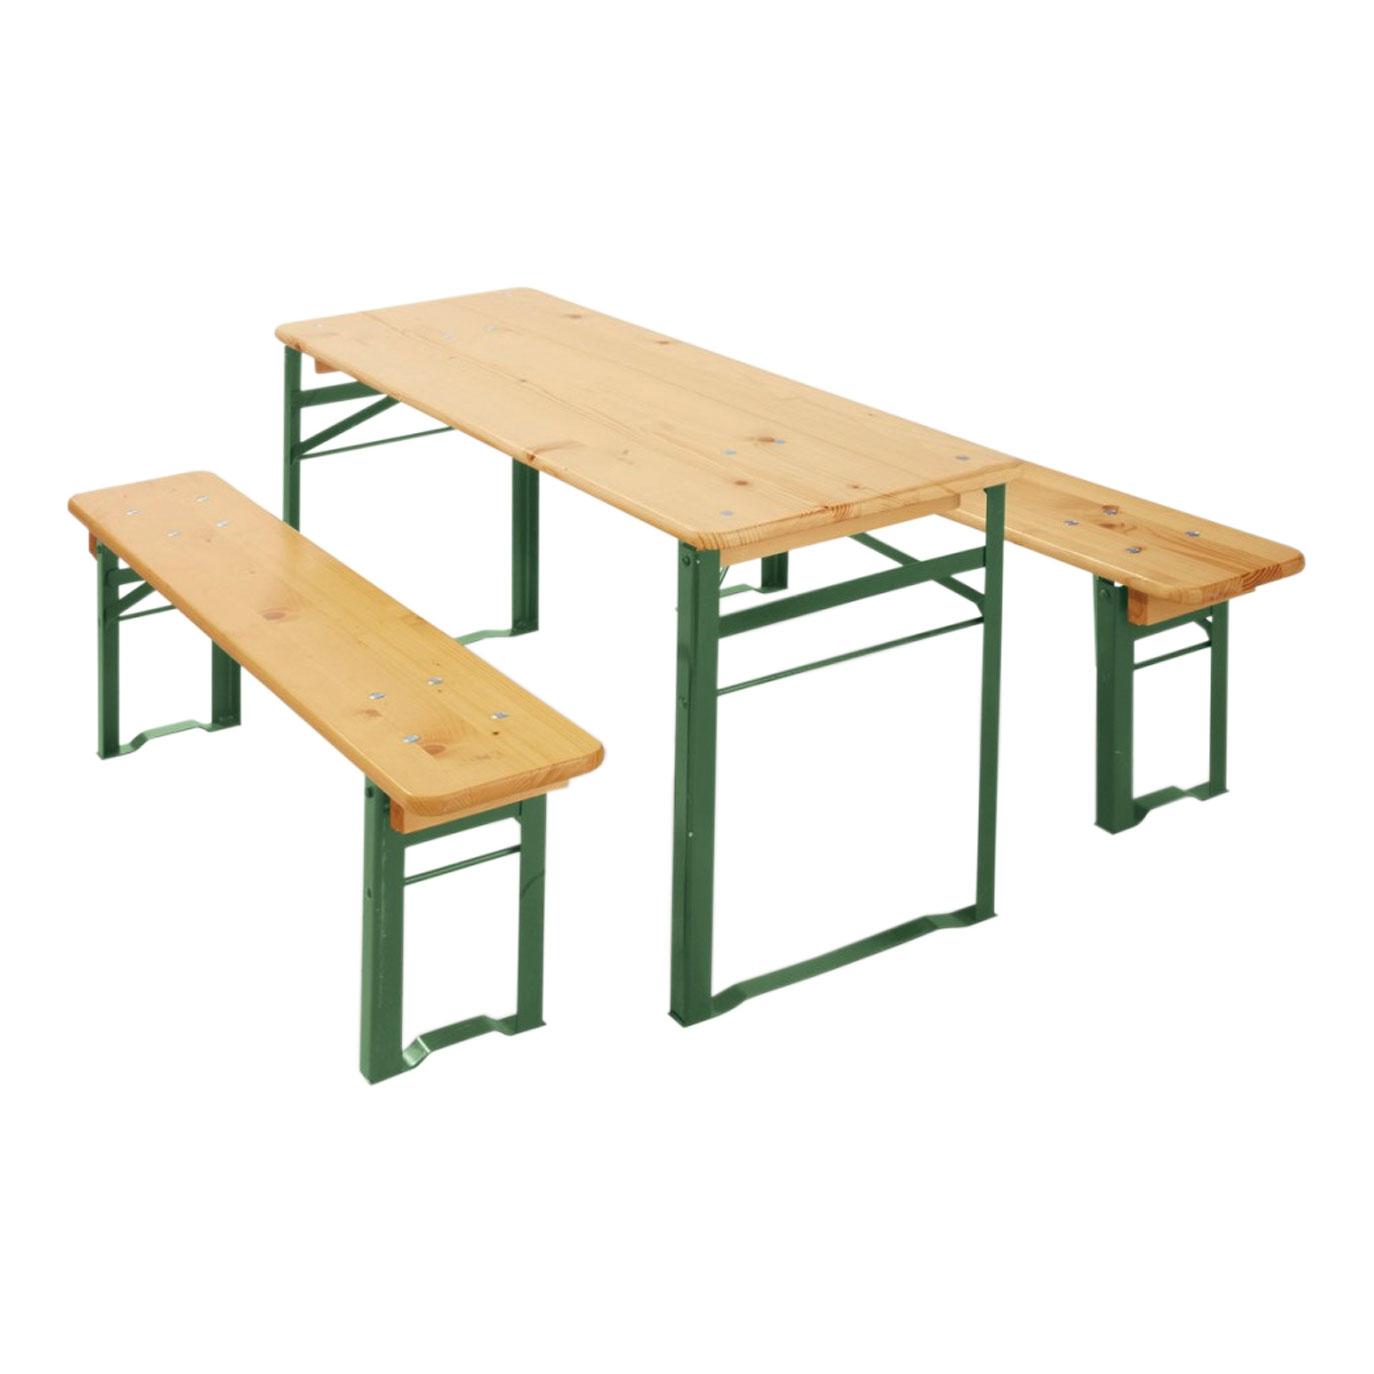 -3-tlg. mit 2 Bänken(L 110 cm, T 20 cm, H 31 cm) und 1 Tisch(L 110 cm, B 50 cm, H 76 cm) – Sitzhöhe: 31 cm